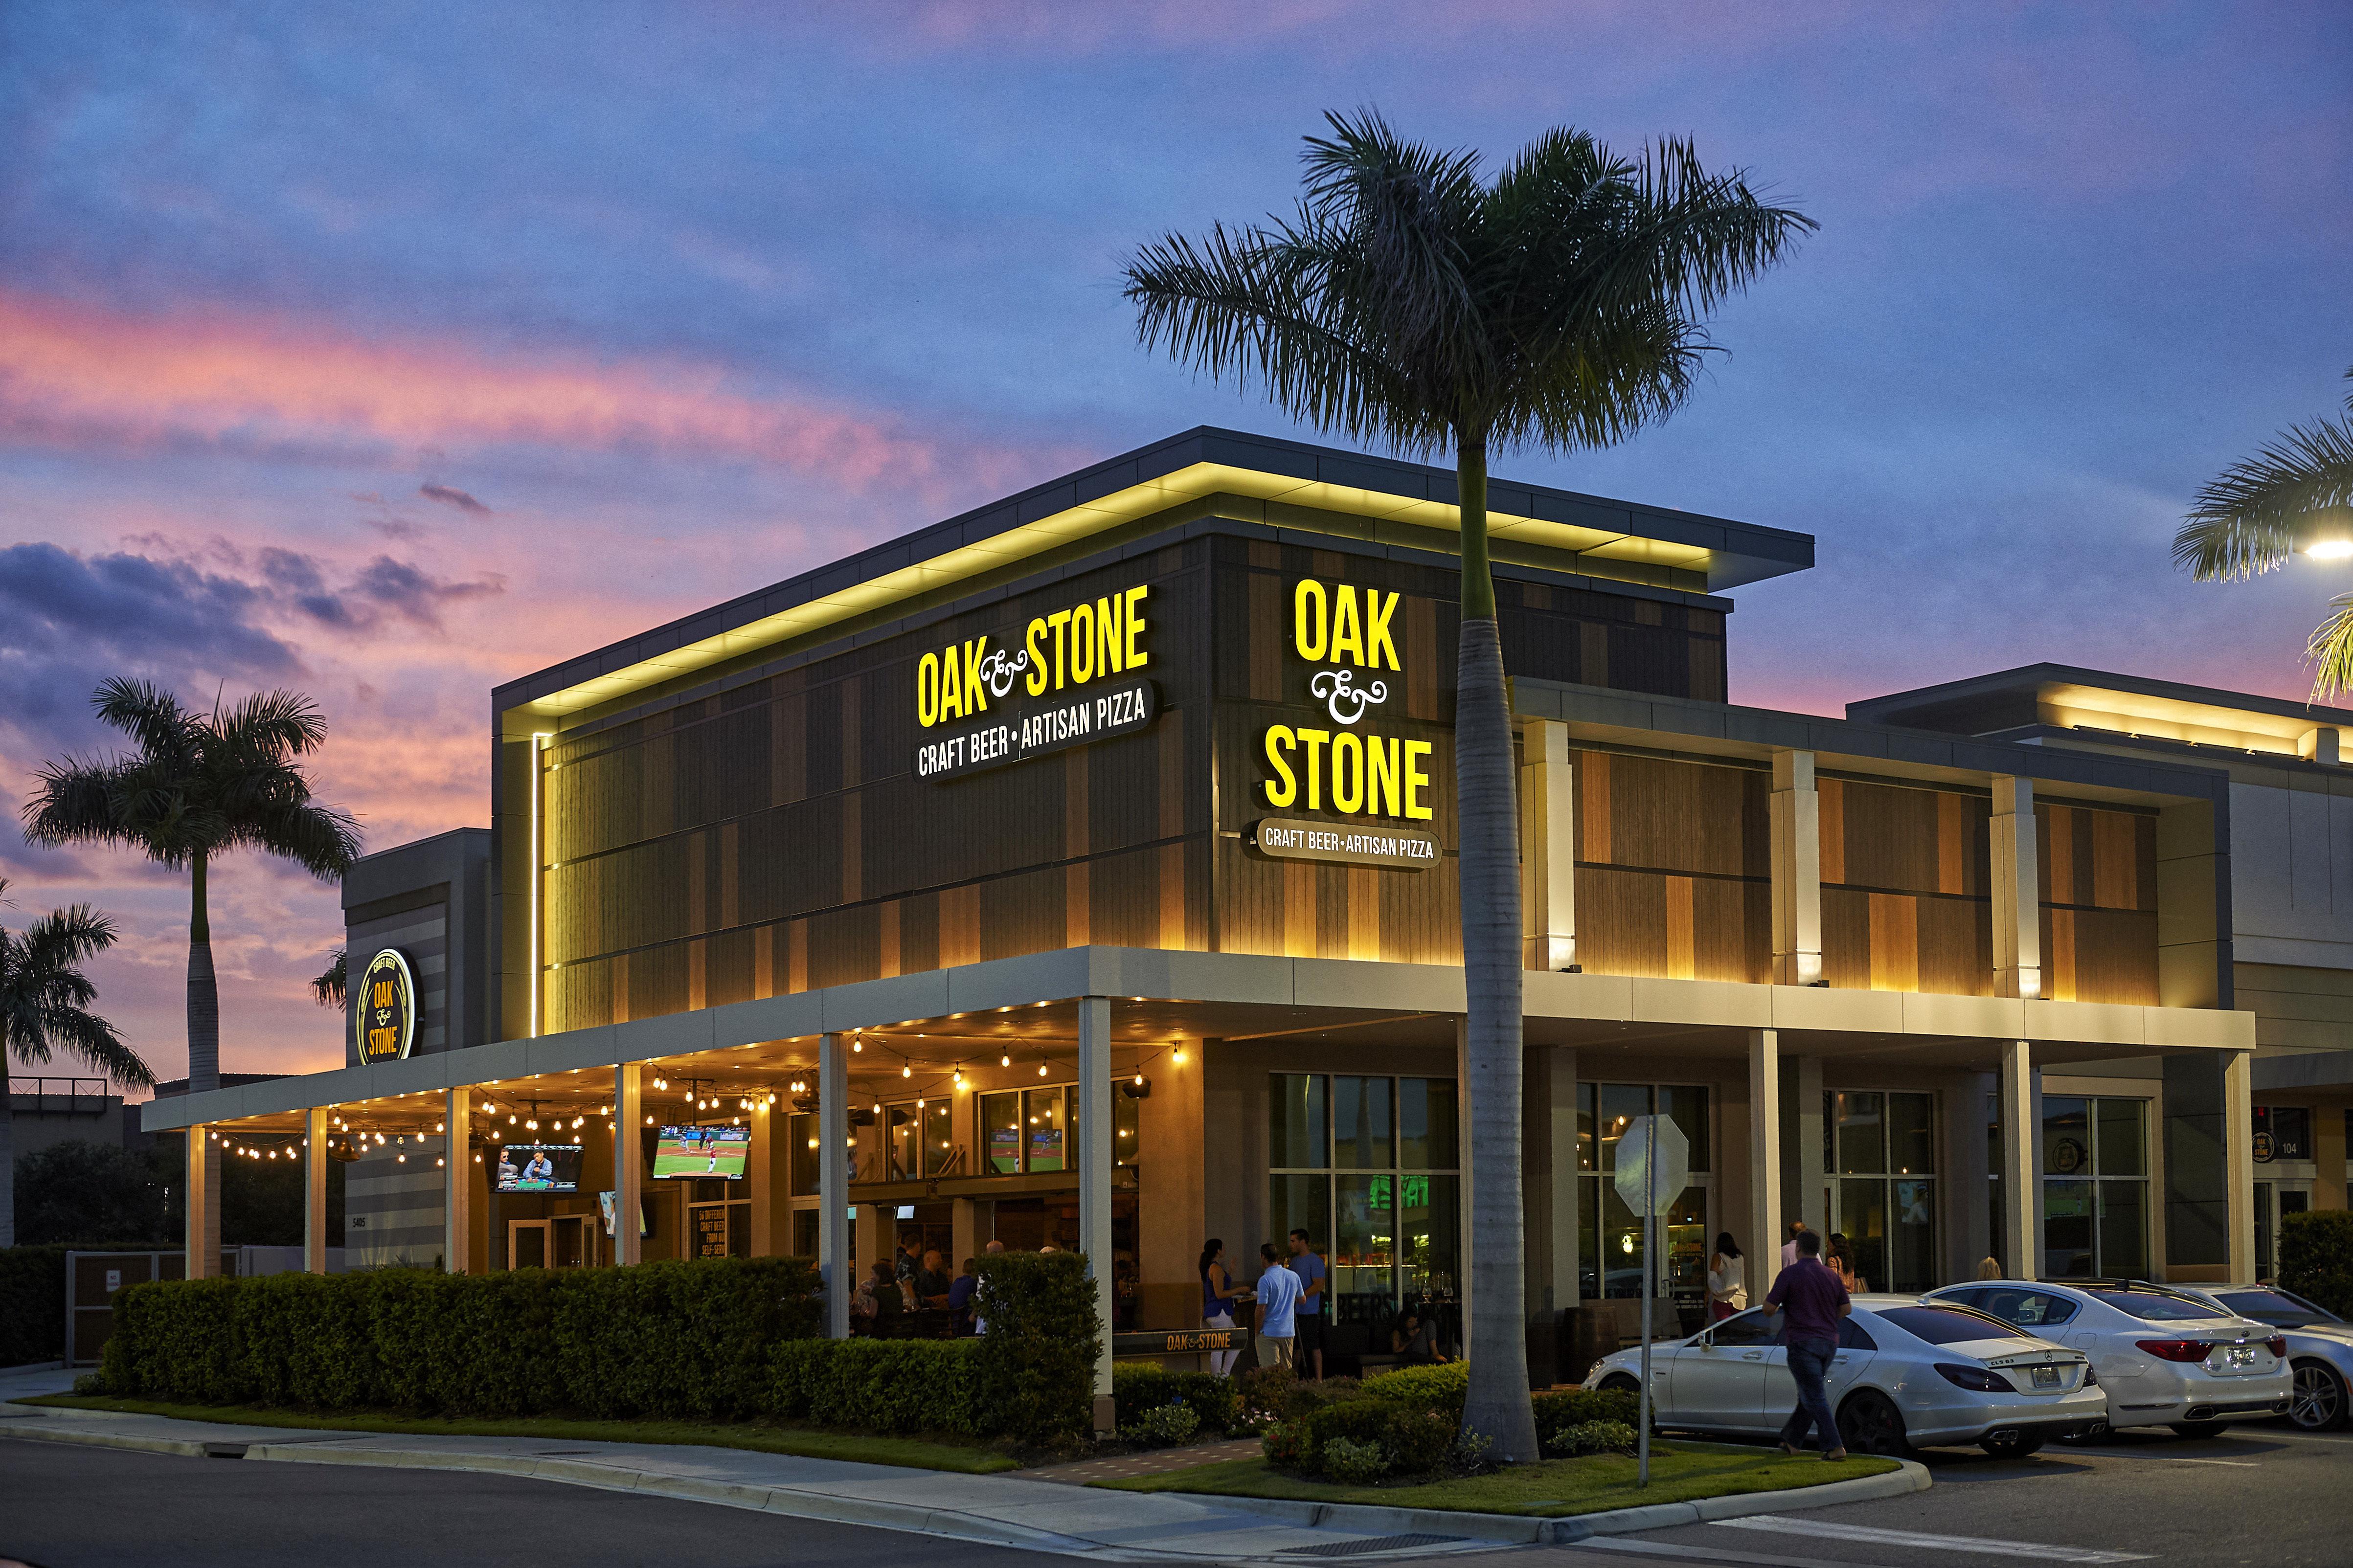 Oak   stone mrbnu8